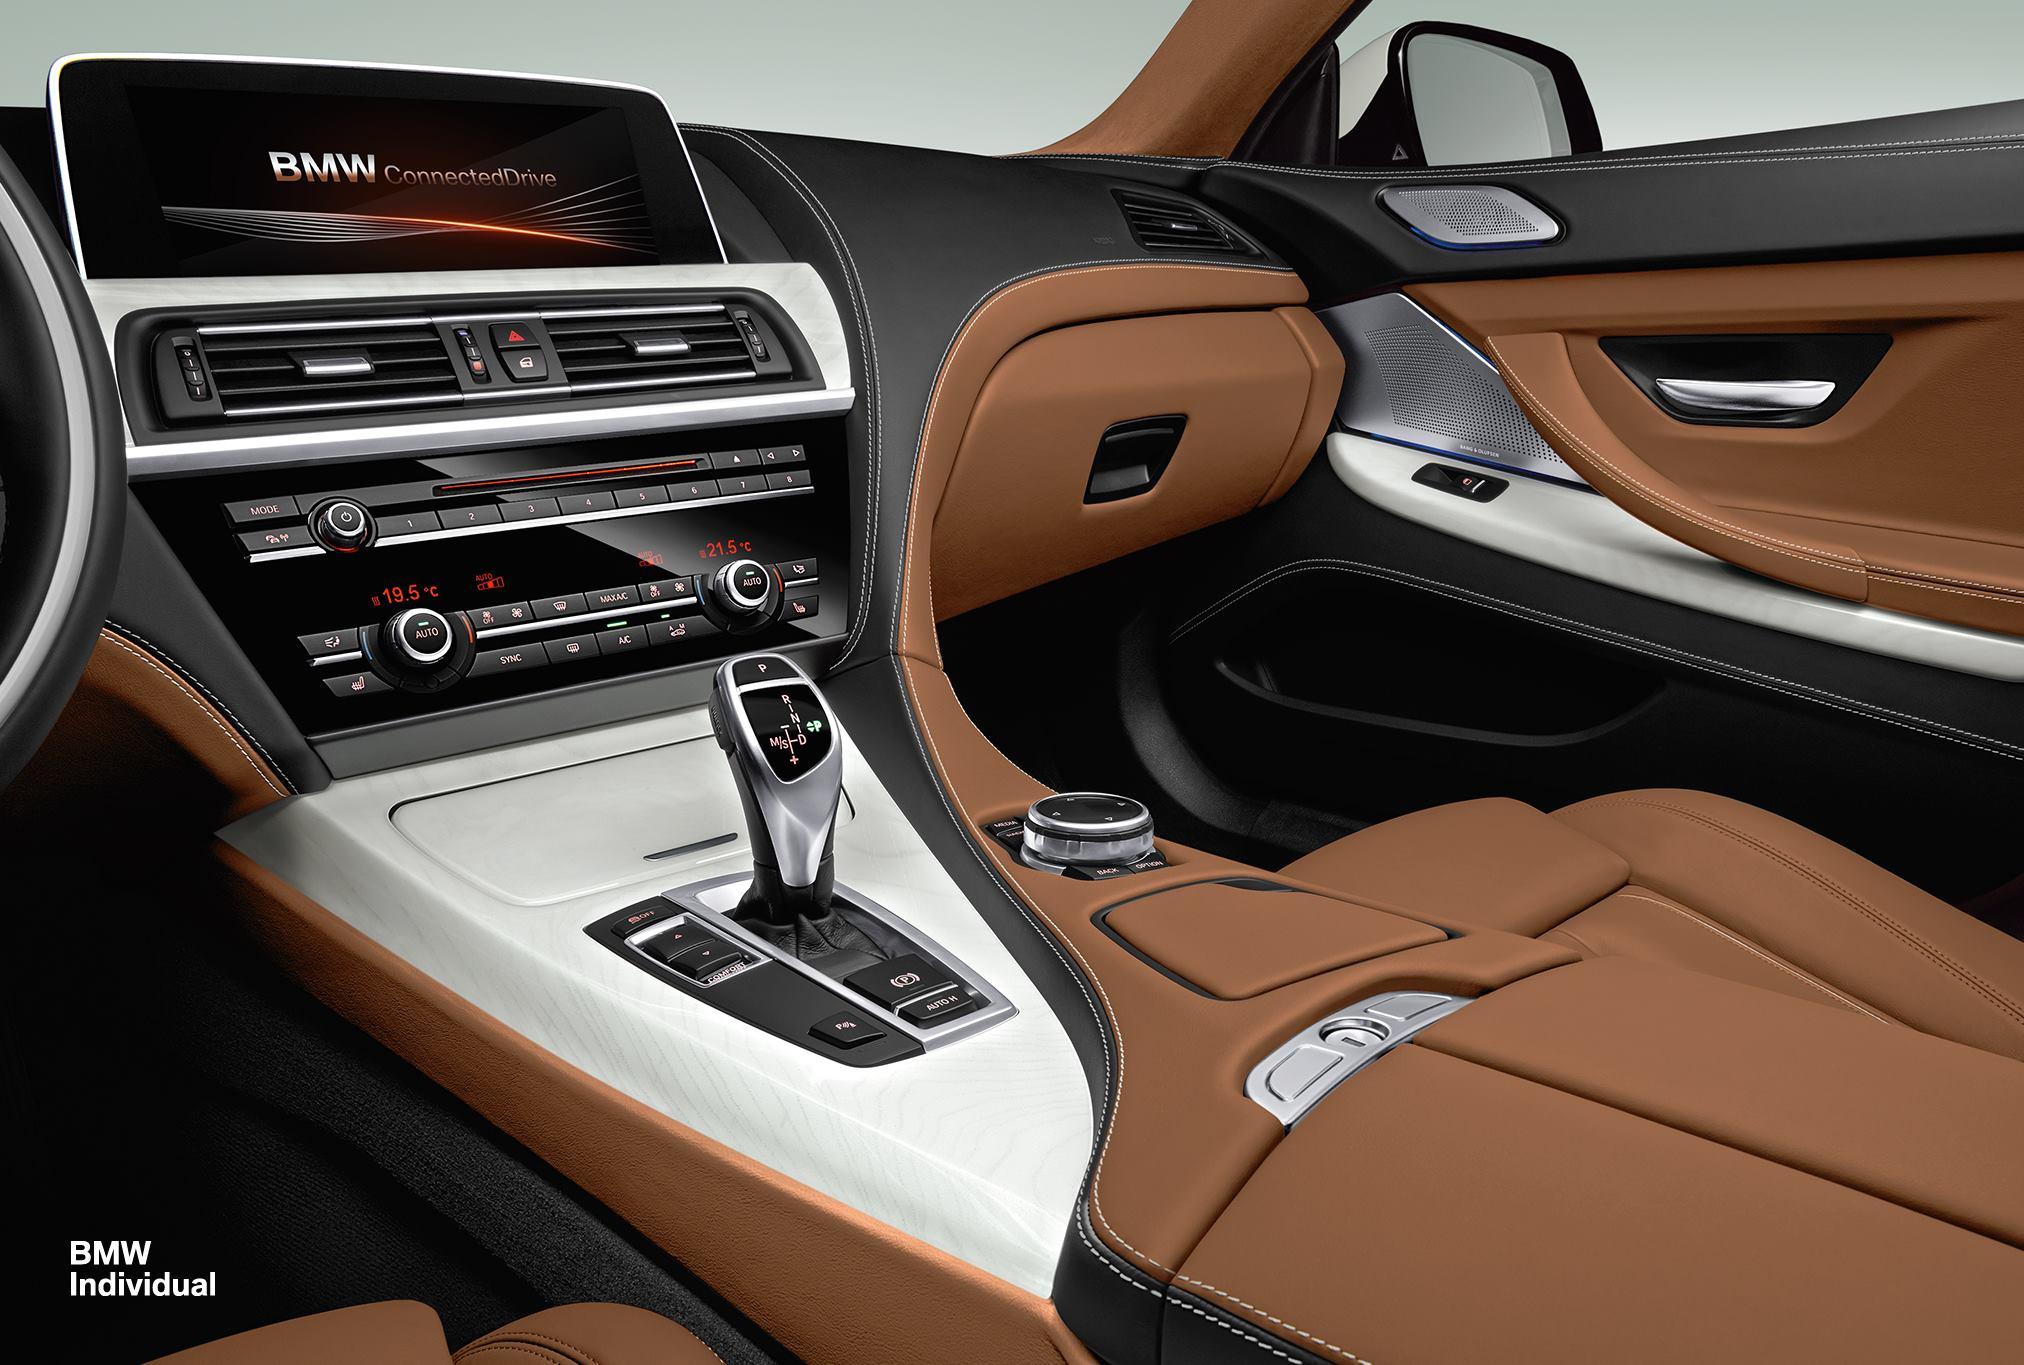 Bmw Serie 3 G20 >> 2015 BMW 6 Series Gran Coupe Individual - Photos